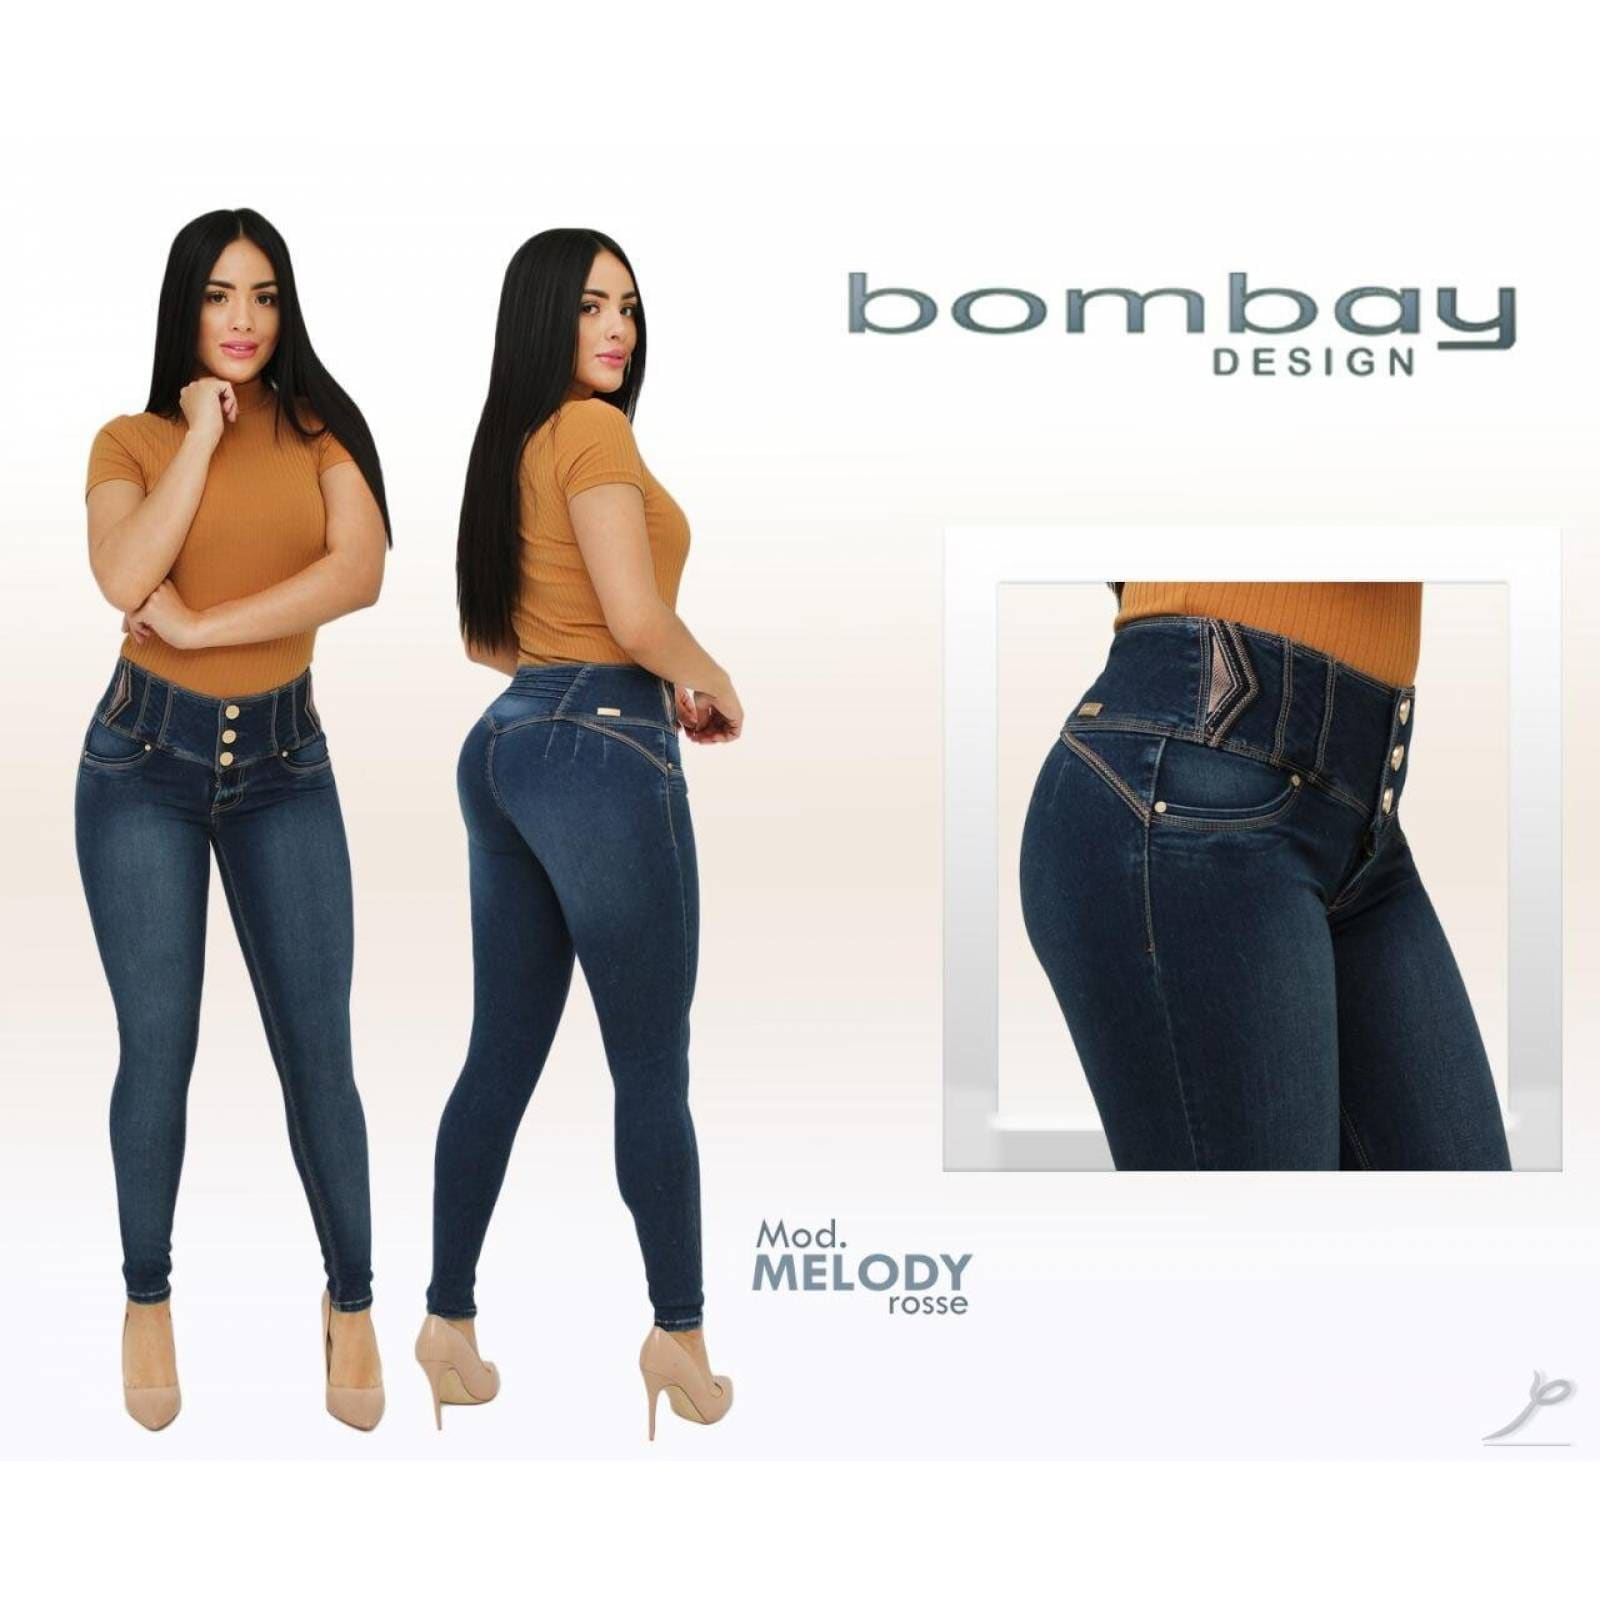 Jeans Dama Bombay Corte Colombiano Melody